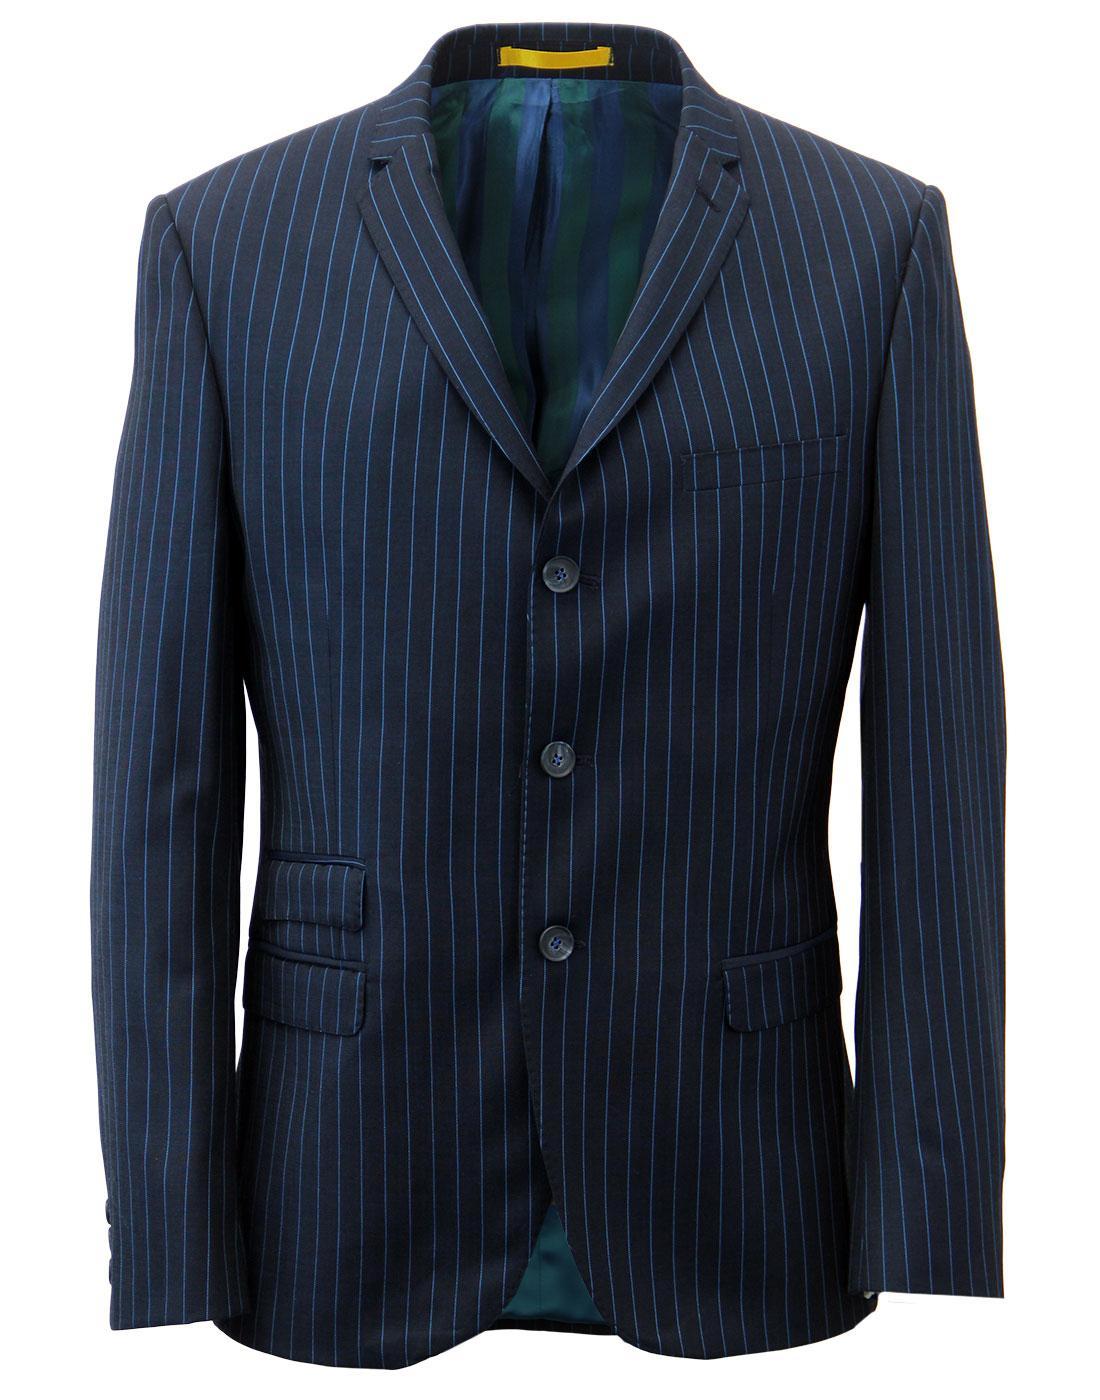 MADCAP ENGLAND Electric Pinstripe Mod Suit Jacket